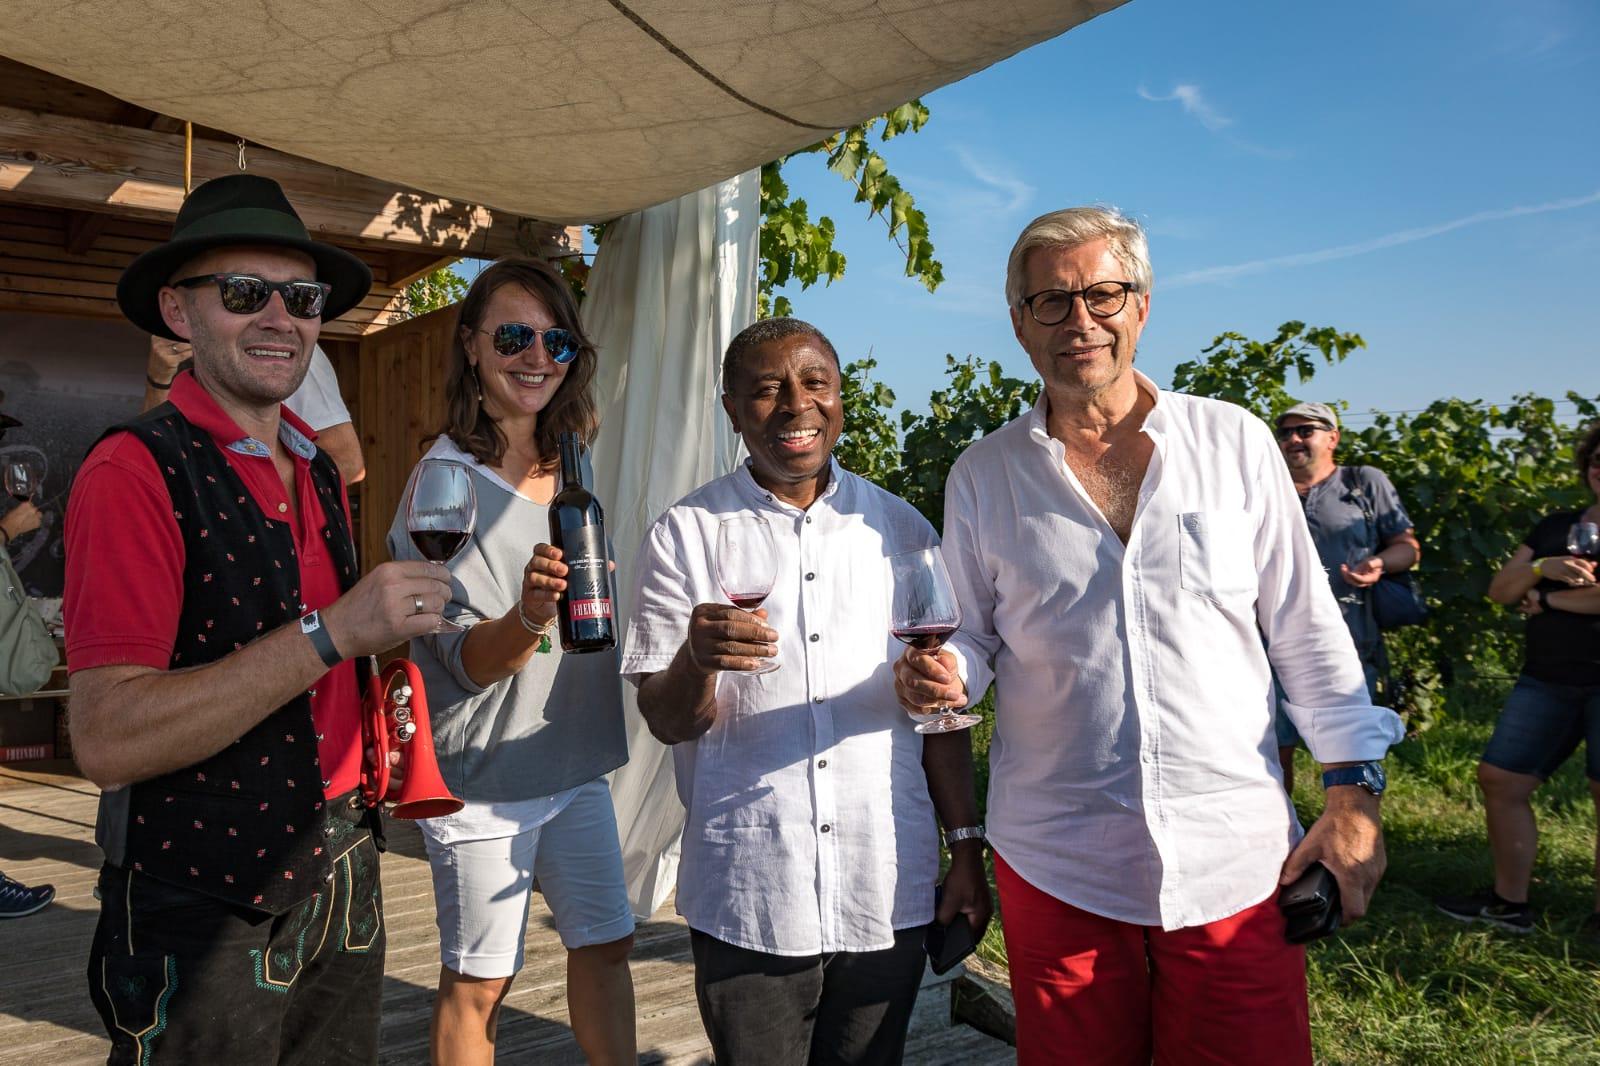 Weingartenwanderung 2020 - Weingut Silvia Heinrich - Gruppenbild Bürgermeister Manfred Kölly - Pfarrer Deutschkreutz - Silvia Heinrich